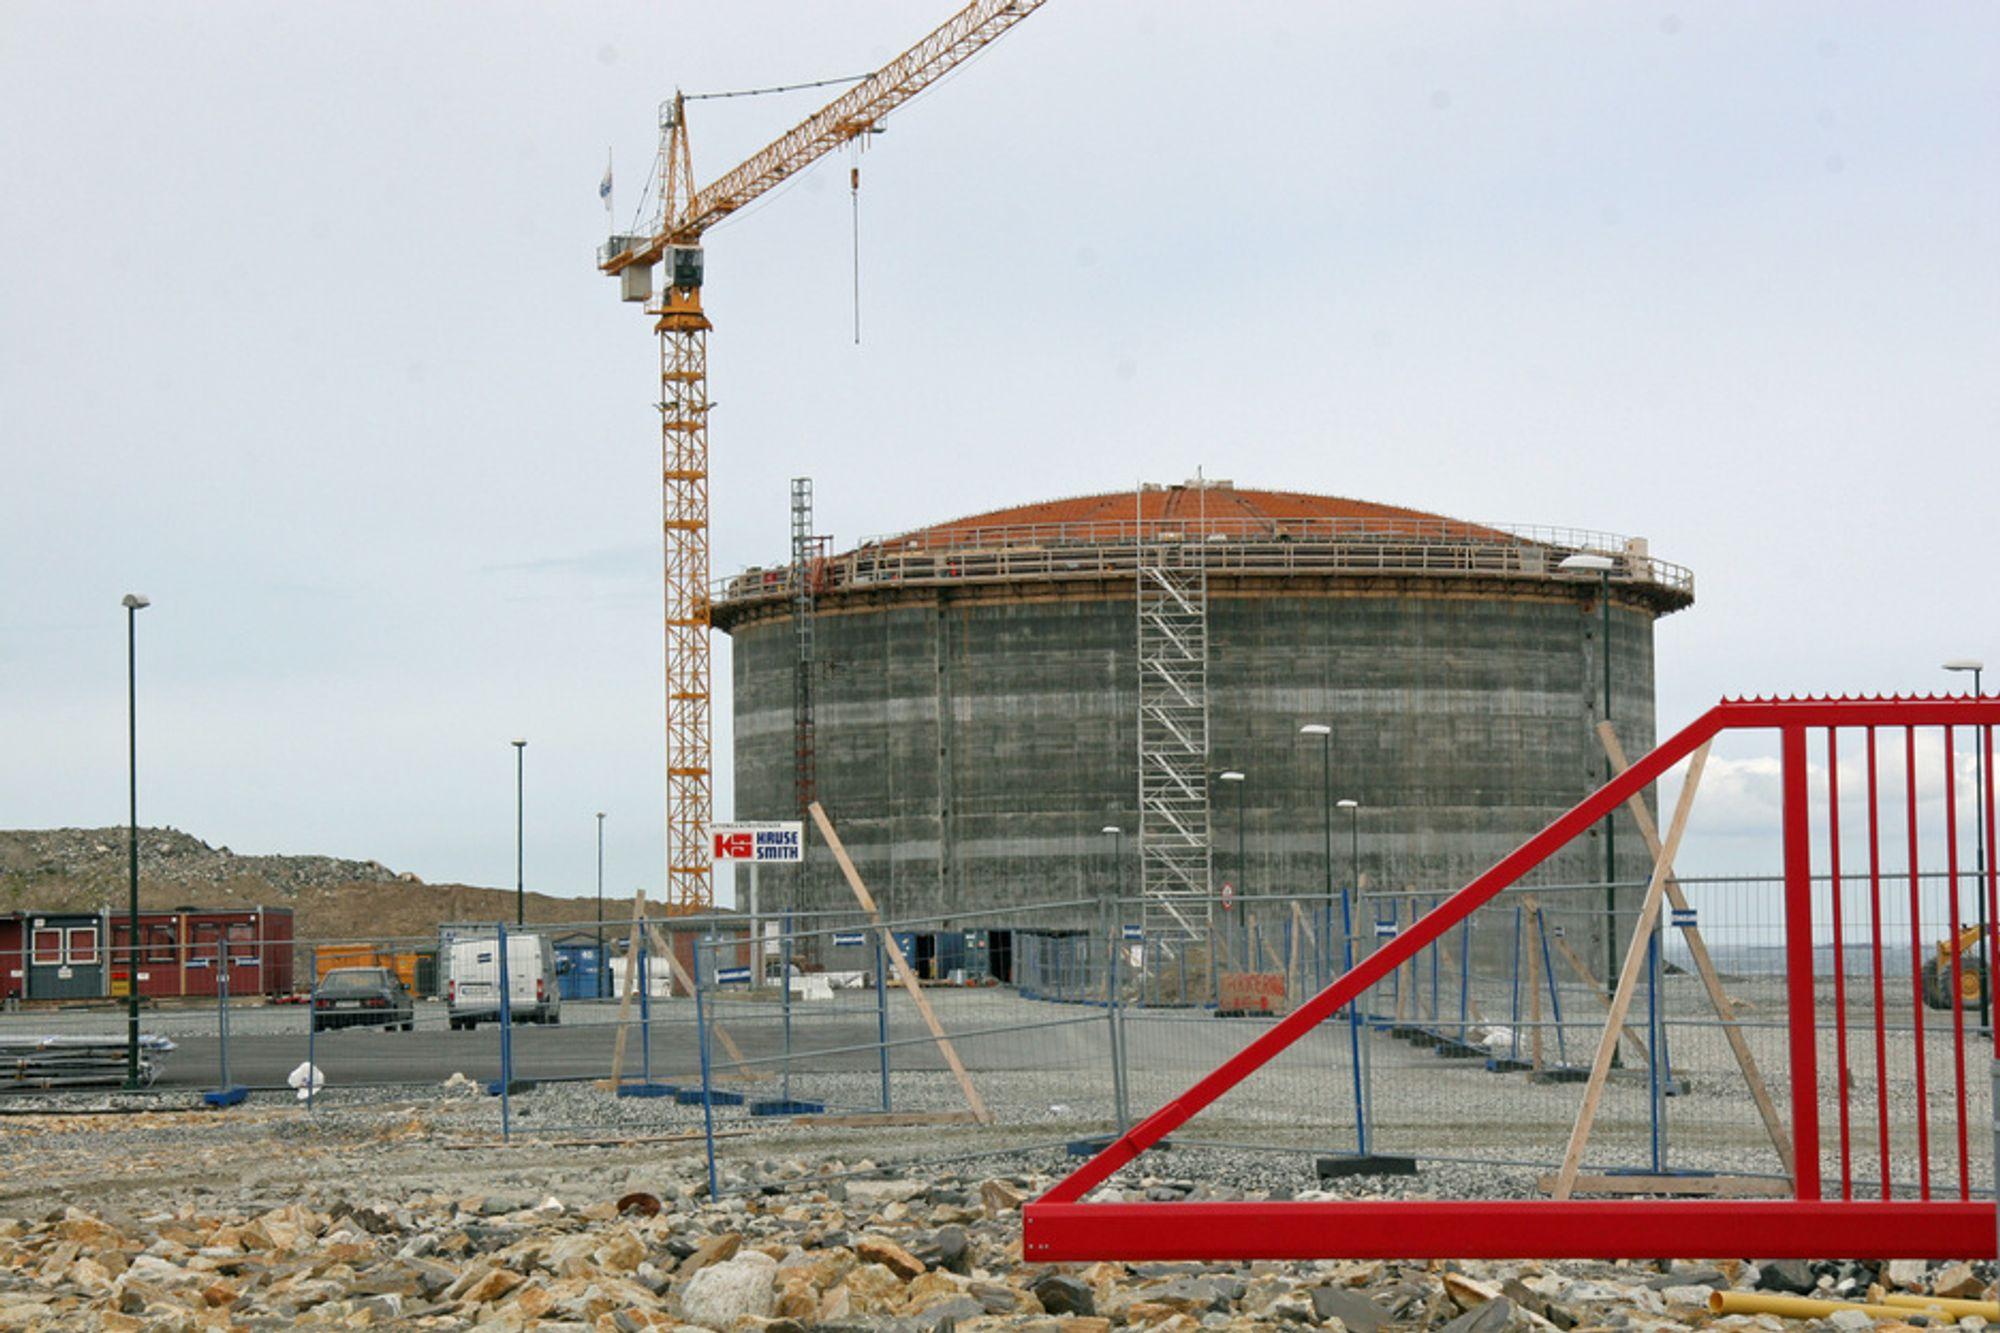 Lyses nye LNG anlegg i Risavika. tatt i juni 2008